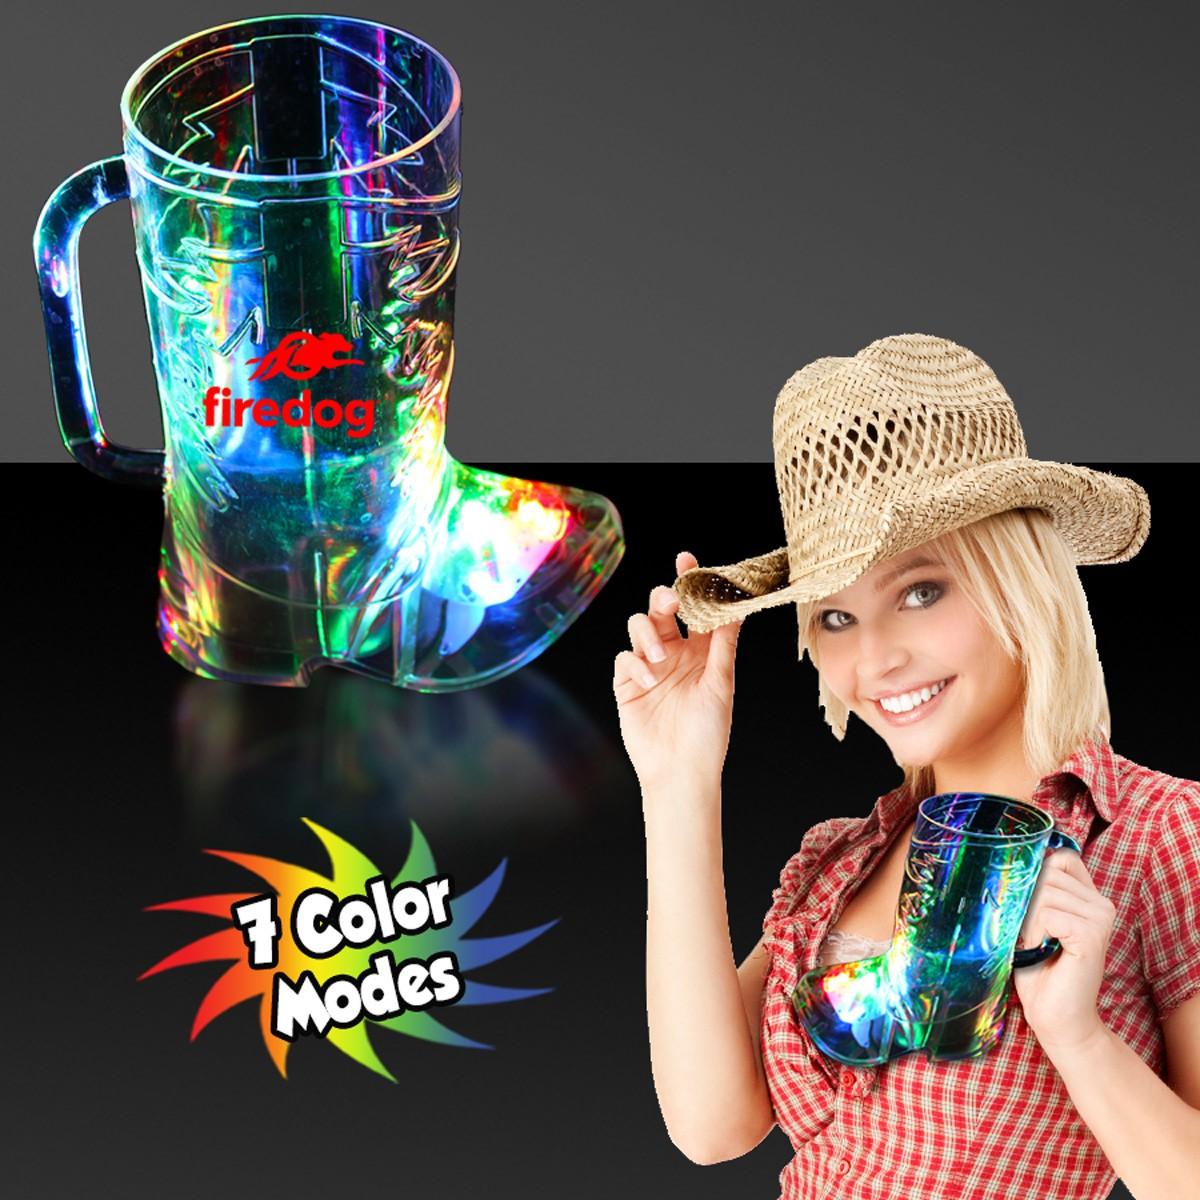 COWBOY BOOT LIGHT-UP CUP